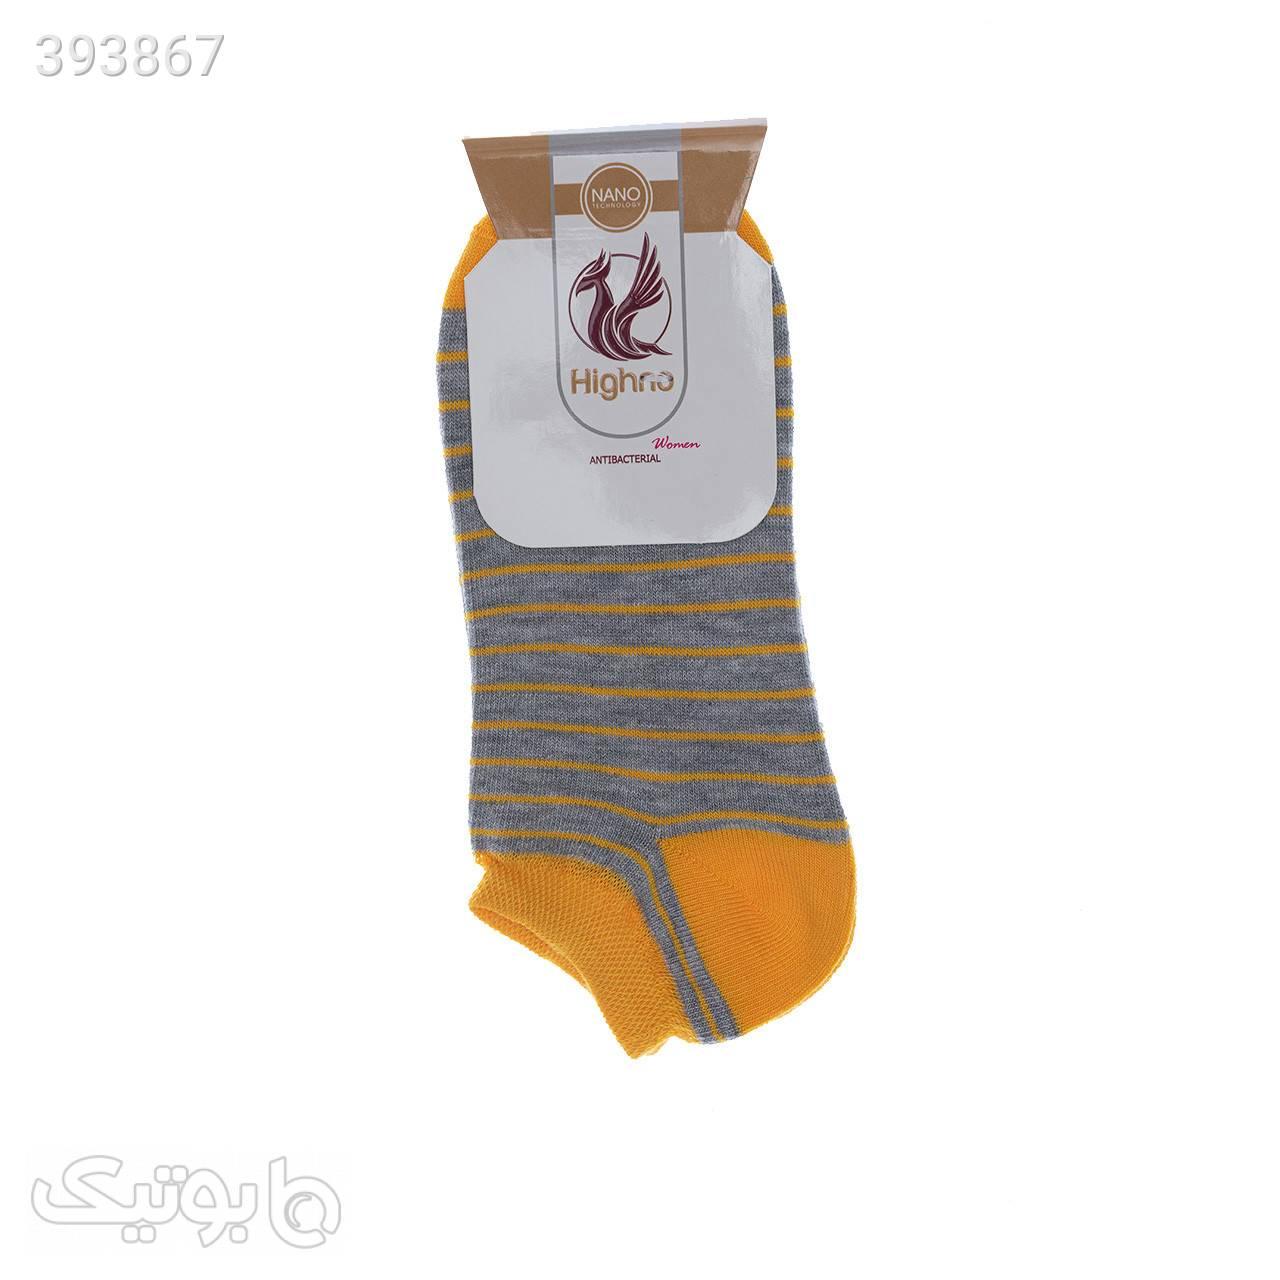 جوراب آنتی باکتریال زنانه مدل 0709-1240 زرد جوراب و پاپوش